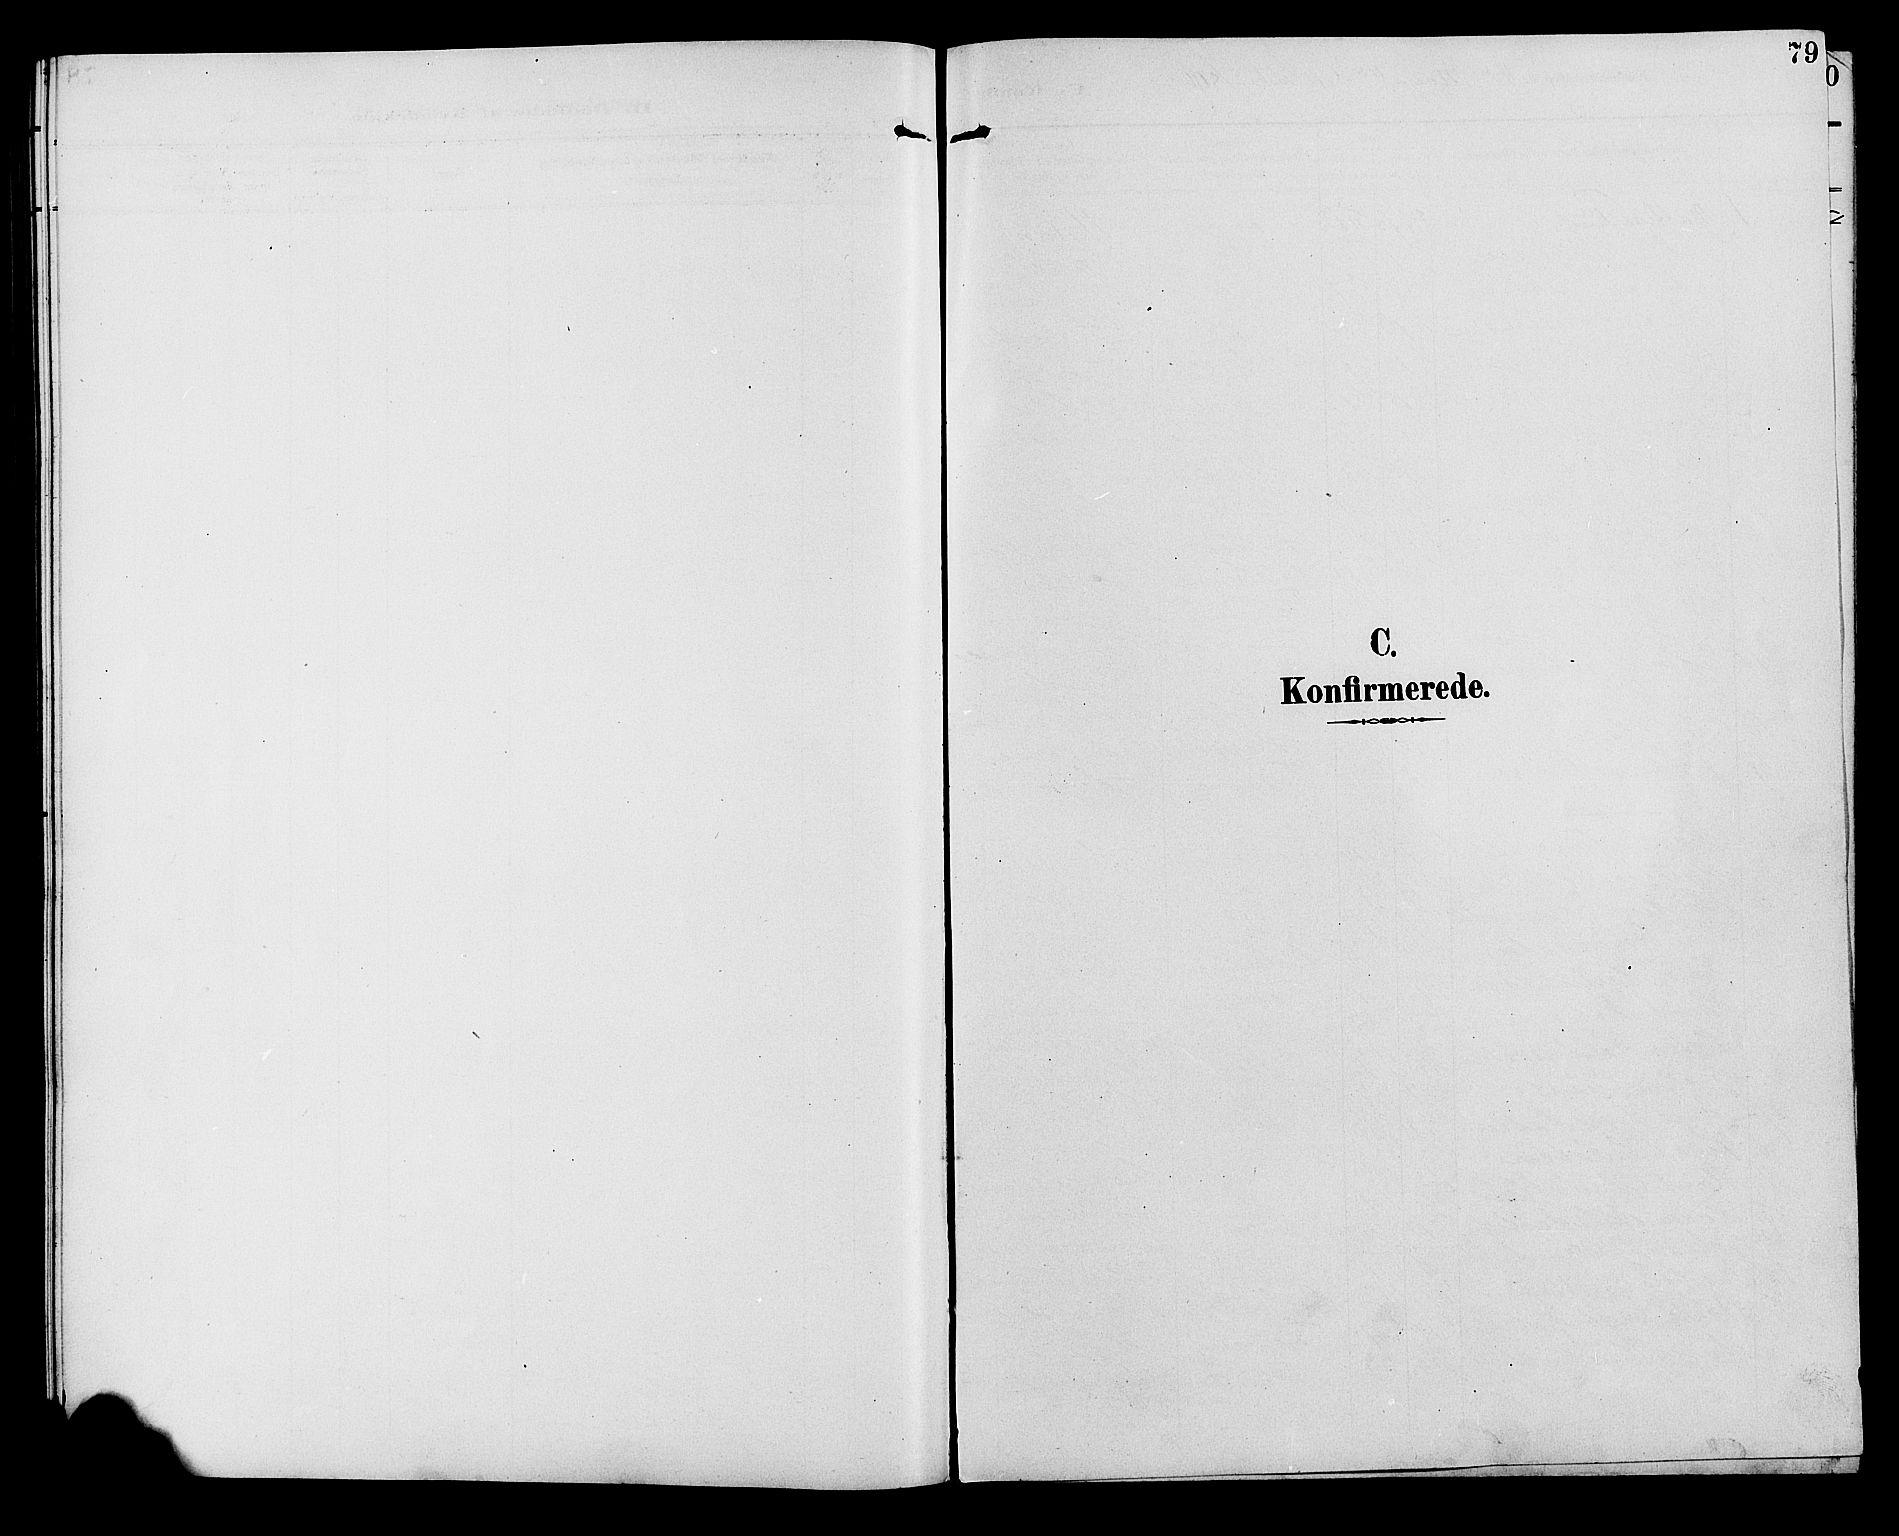 SAH, Ringebu prestekontor, Klokkerbok nr. 7, 1890-1910, s. 79